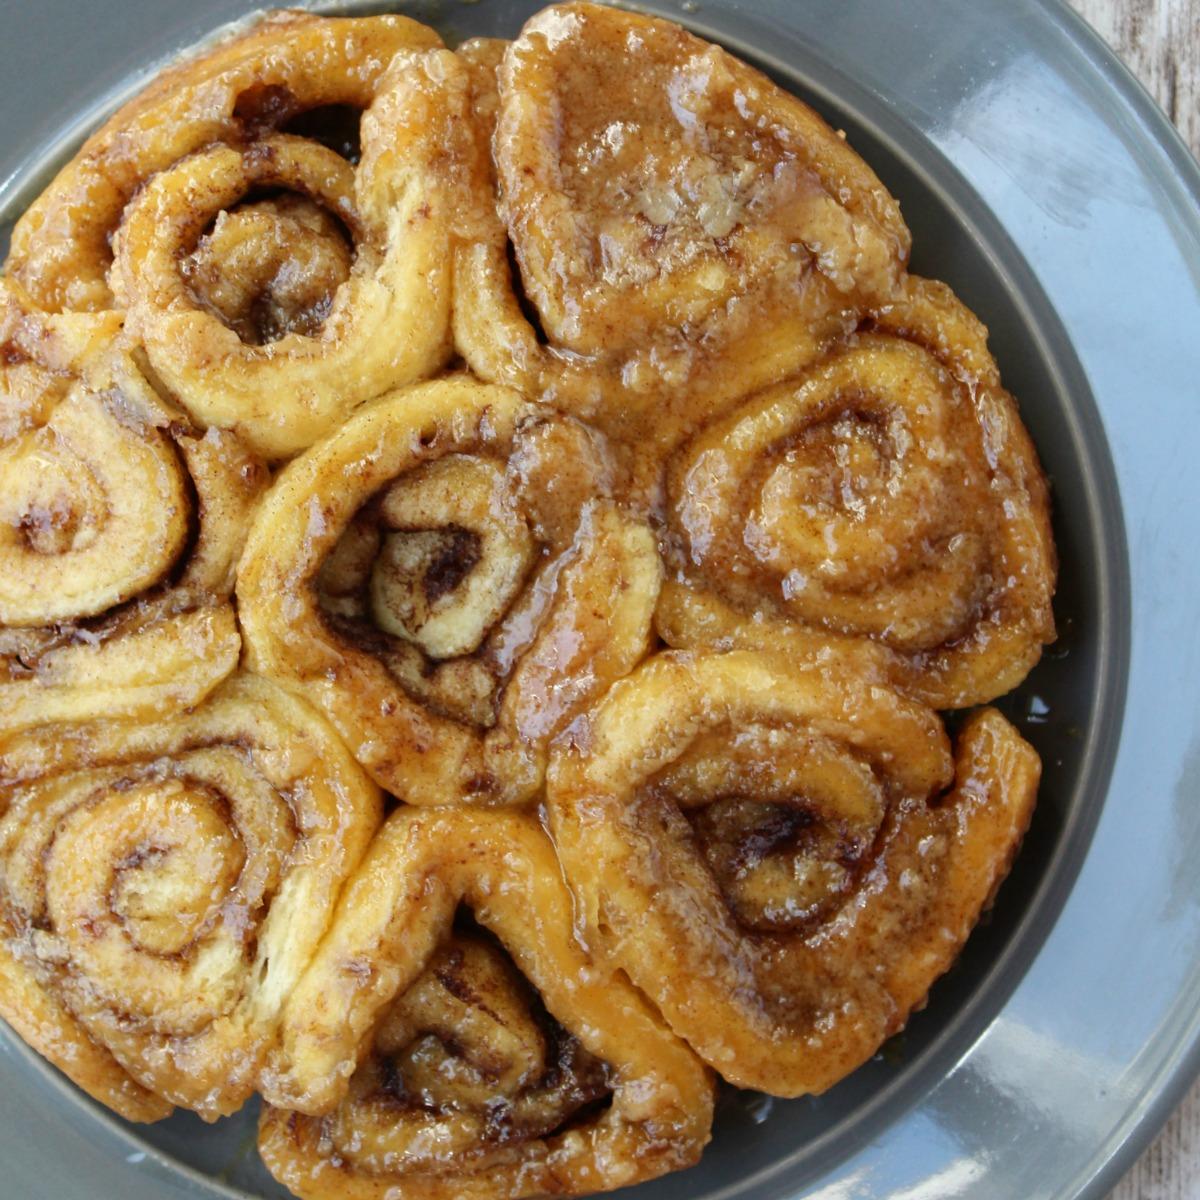 brown sugar cinnamon rolls on a gray plate